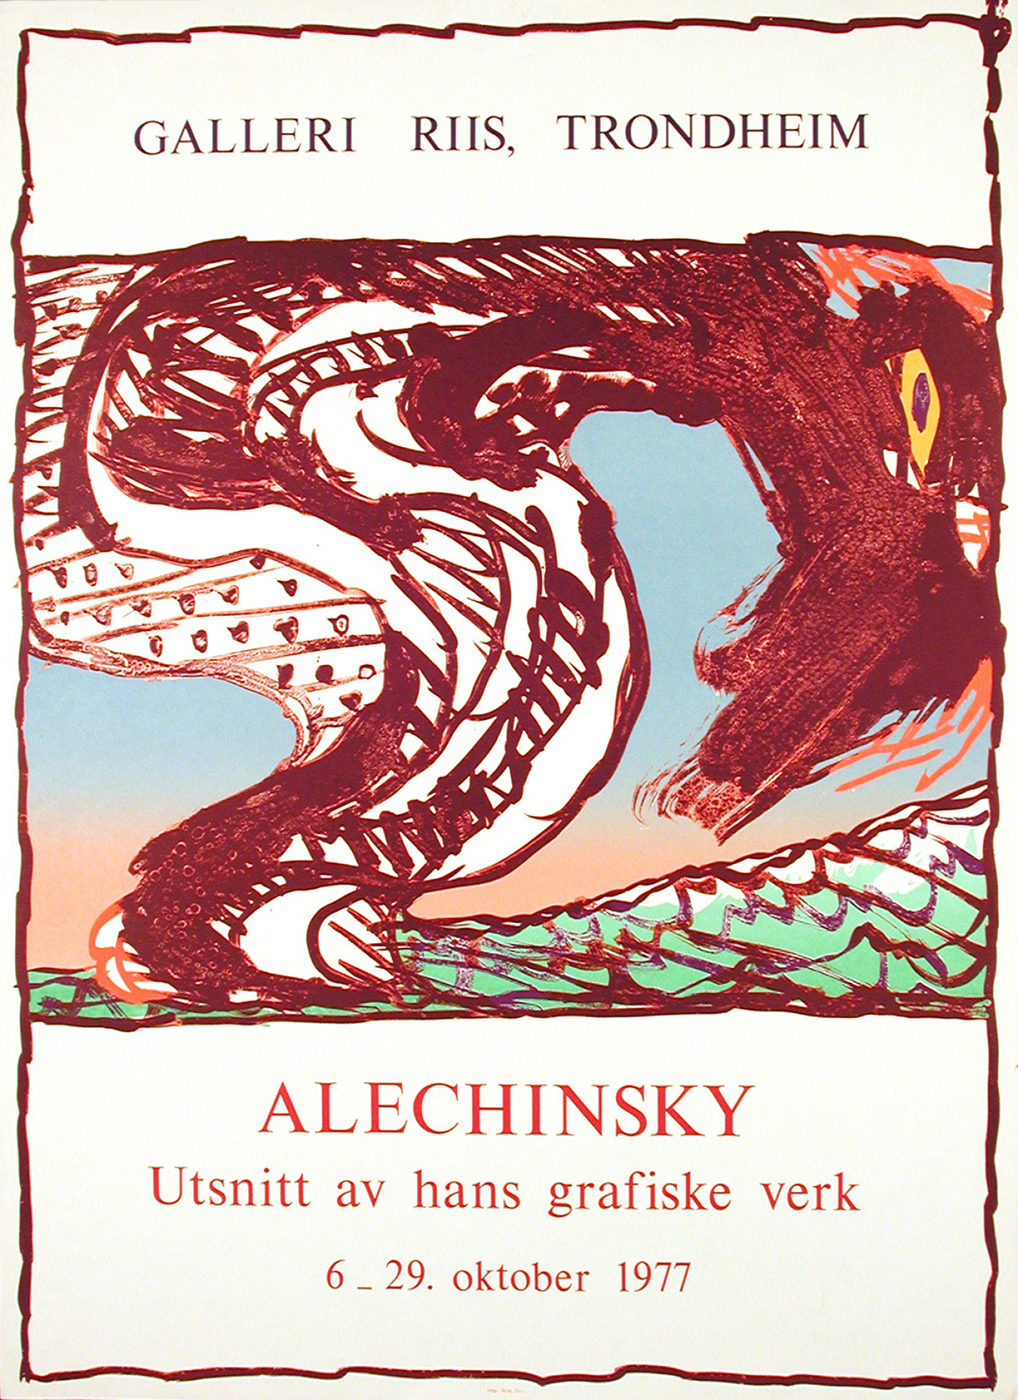 Galerie Michelle Champetier : Pierre Alechinsky / Utsnitt Av Hans Grafiske  Verk (Choix Parmi L'oeuvre Gra à Oeuvre Alechinsky